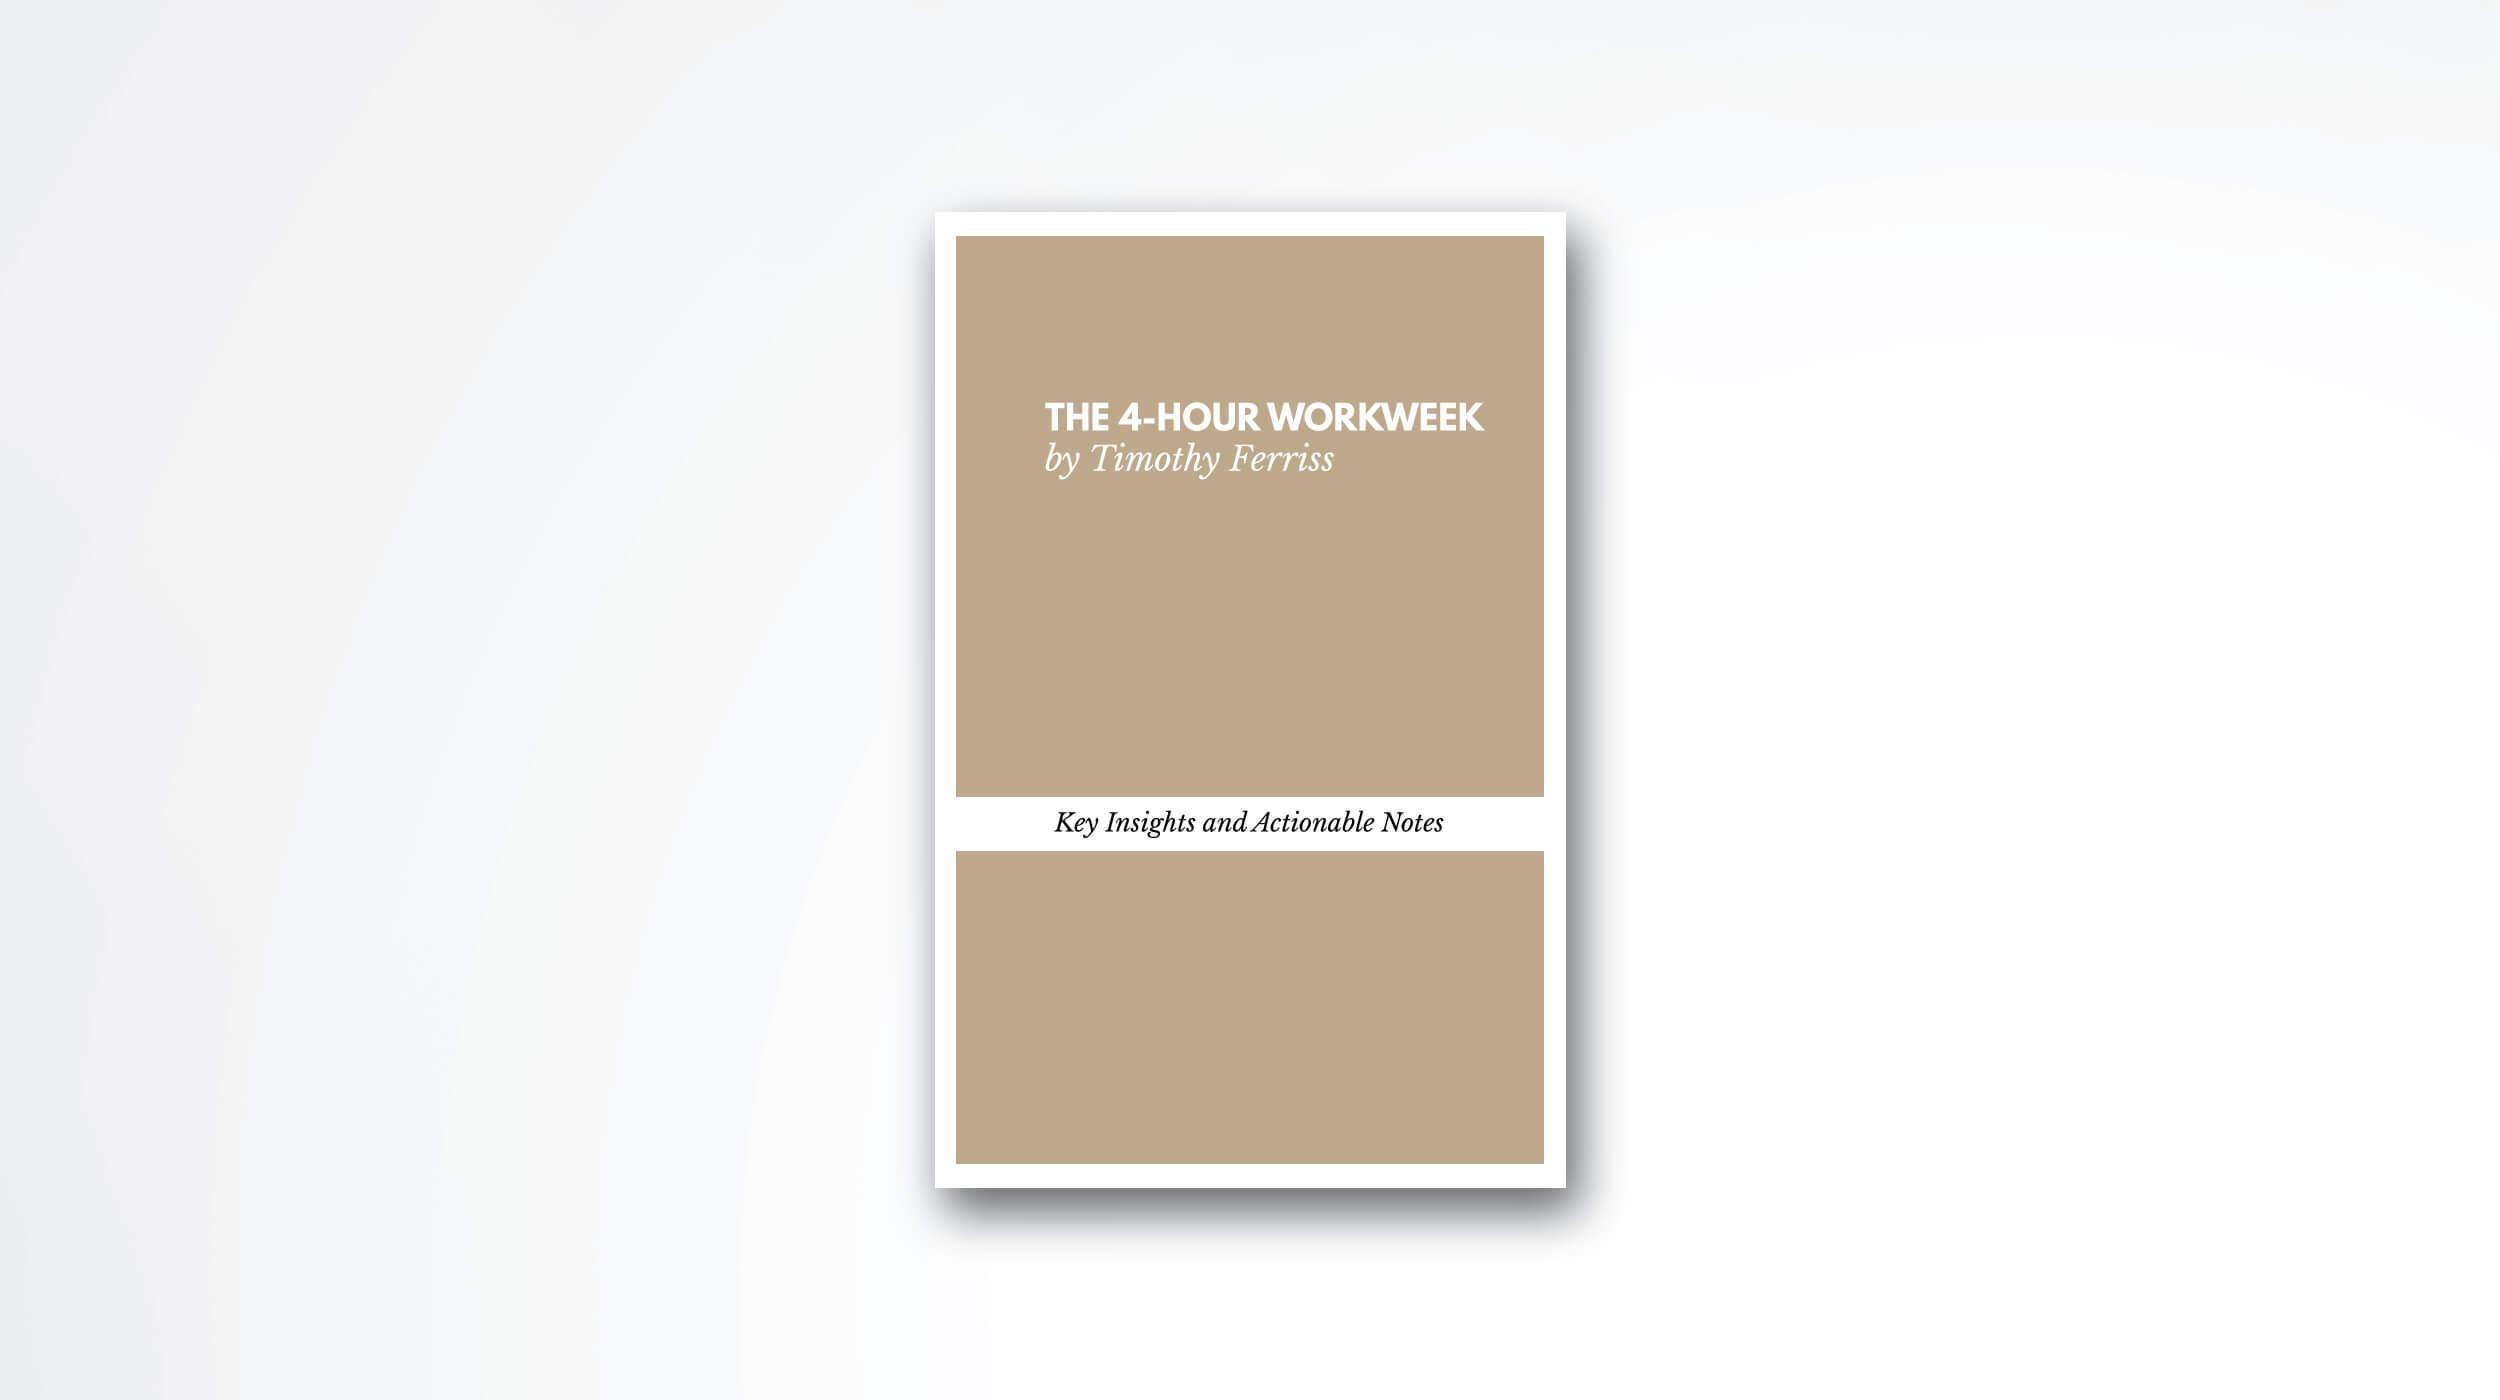 the-4-hour-workweek-book-summary